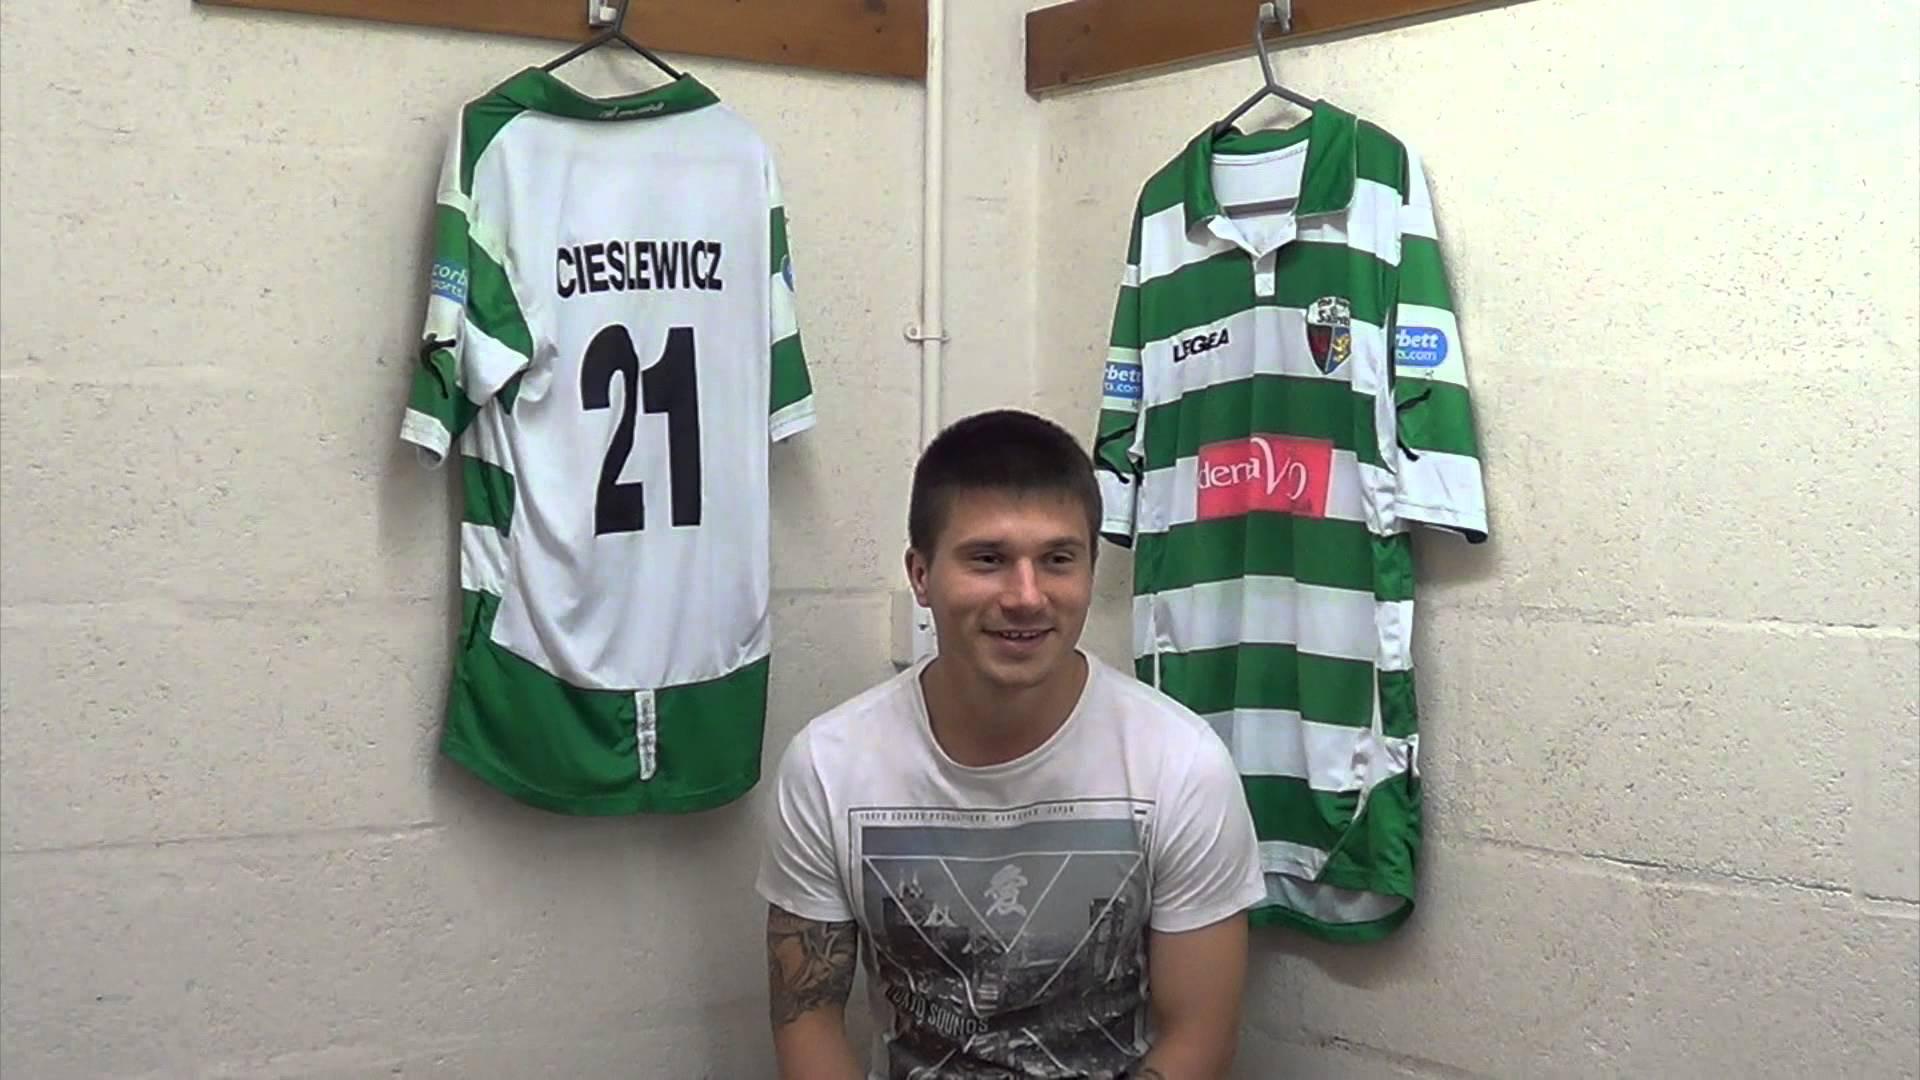 cieslewicz_adrian_calcio_ucl_tns_b36